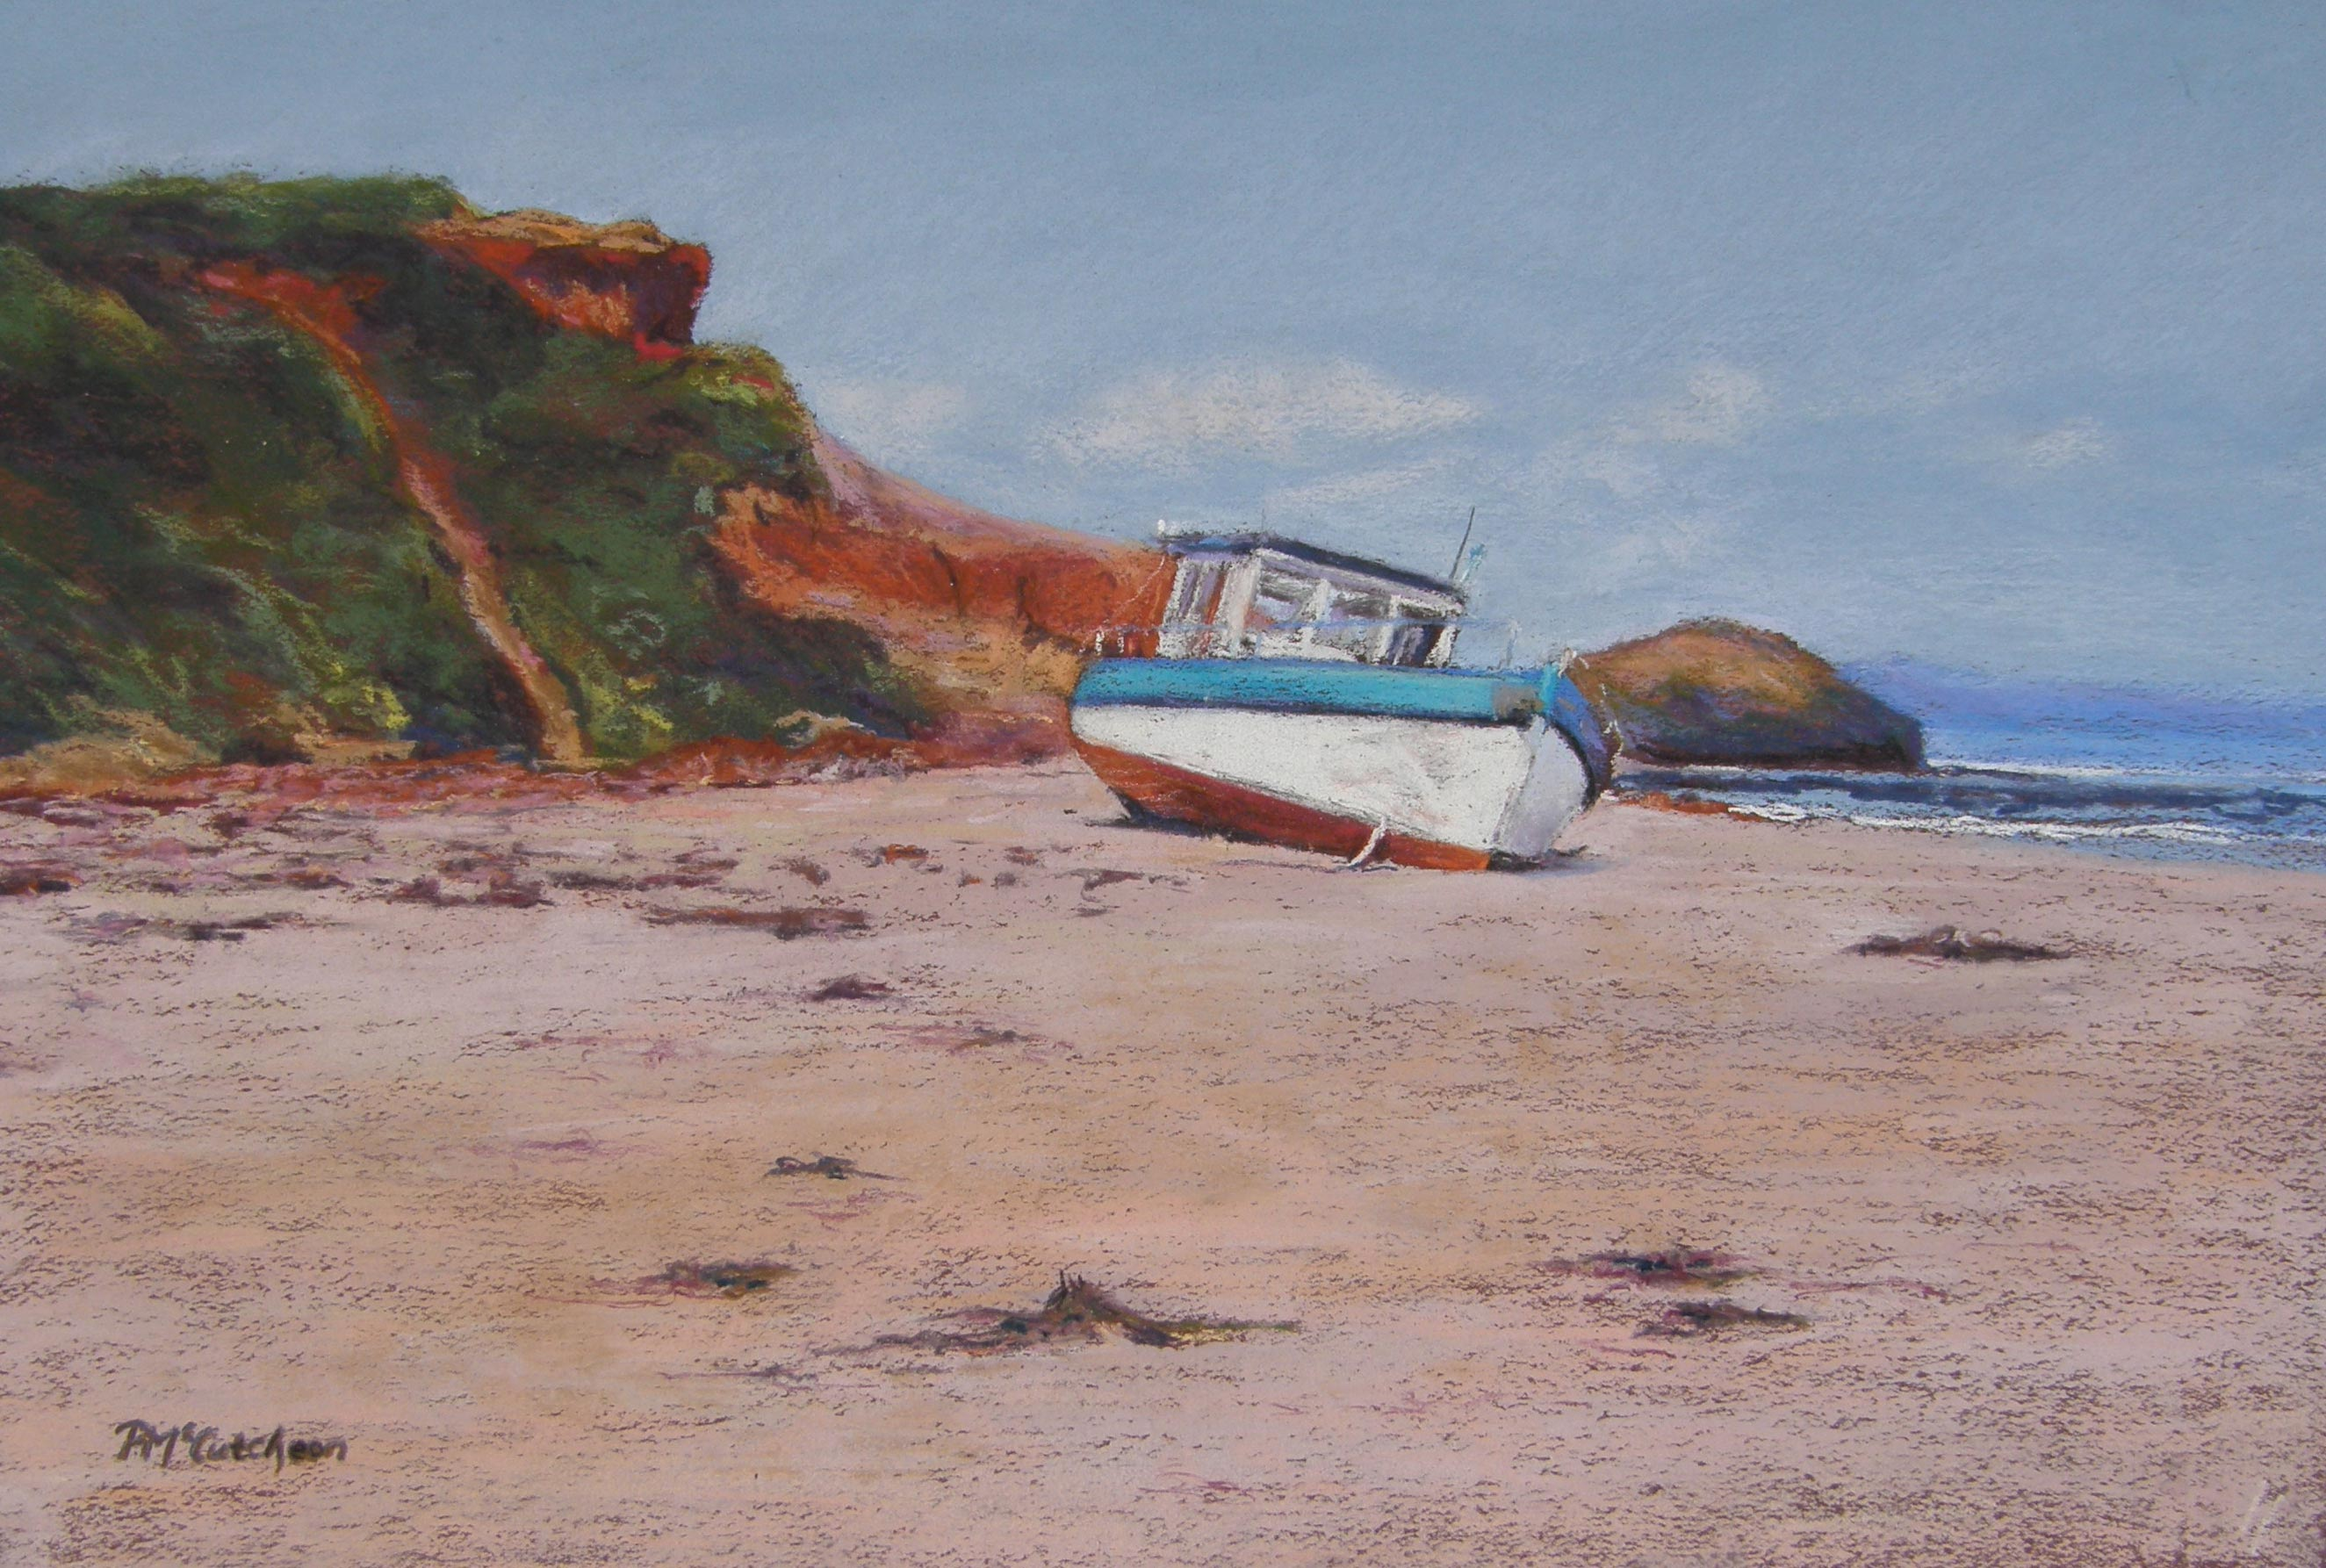 Stranded, Phillip Island